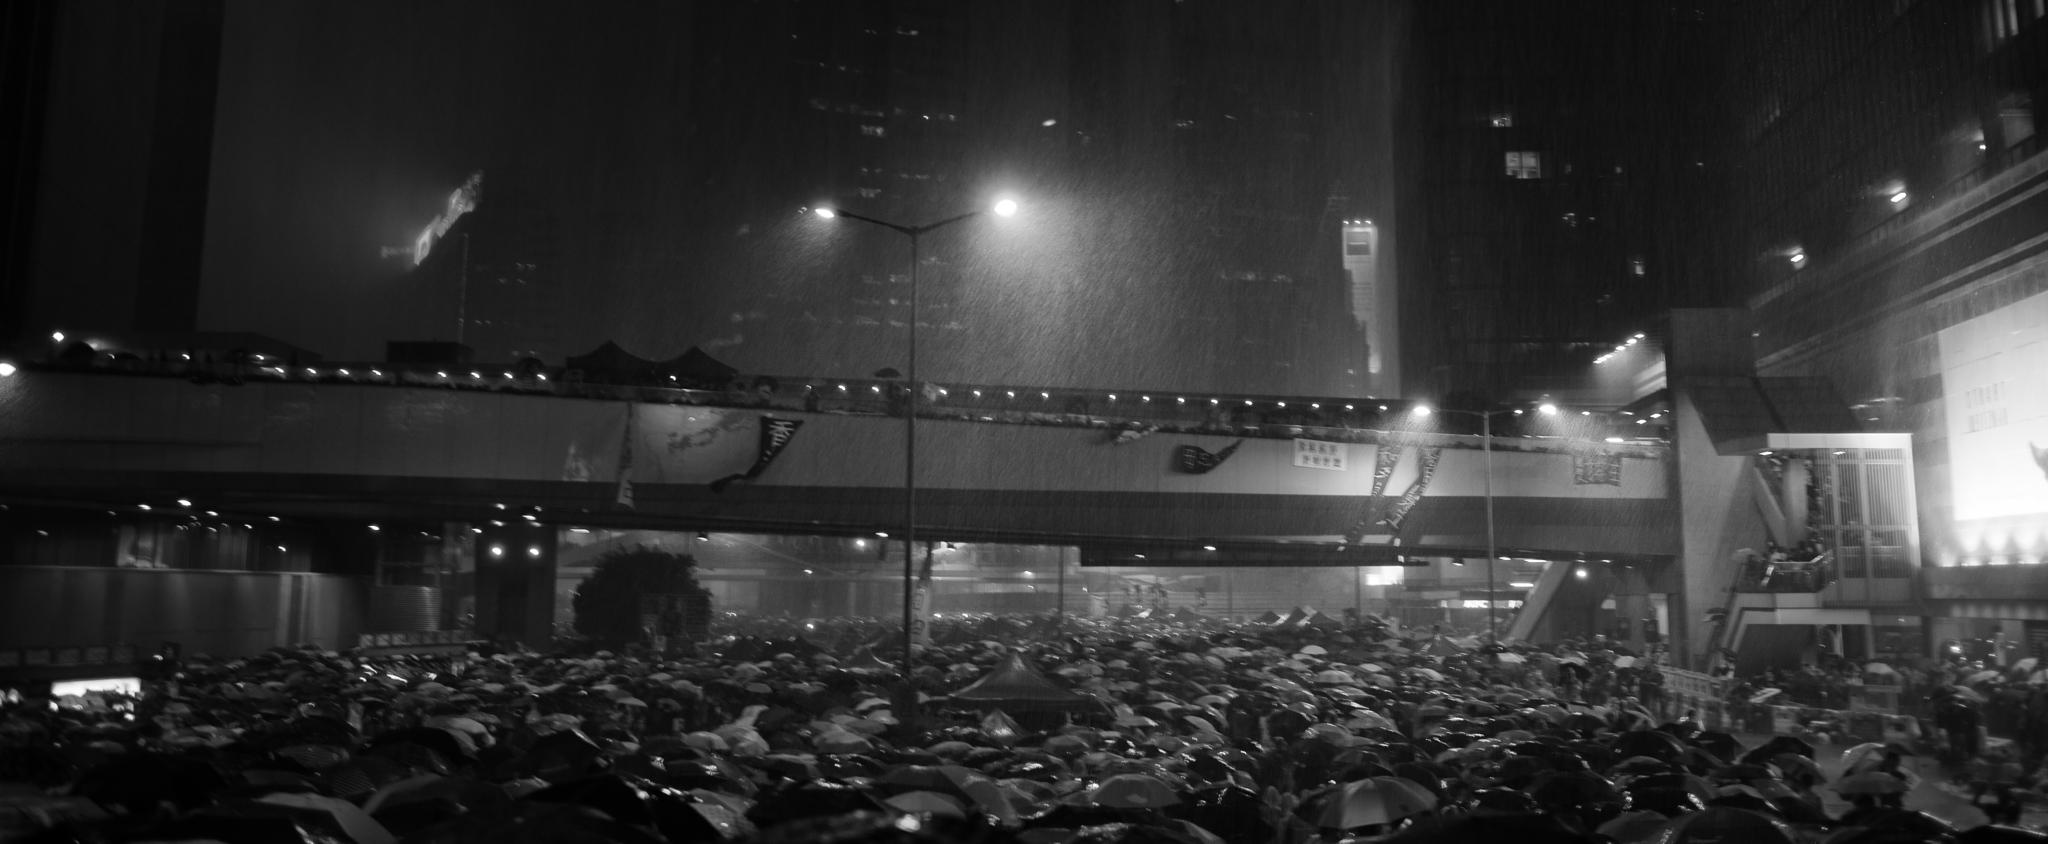 Umbrella Revolution, Hong Kong 2014 by Dickens Lum